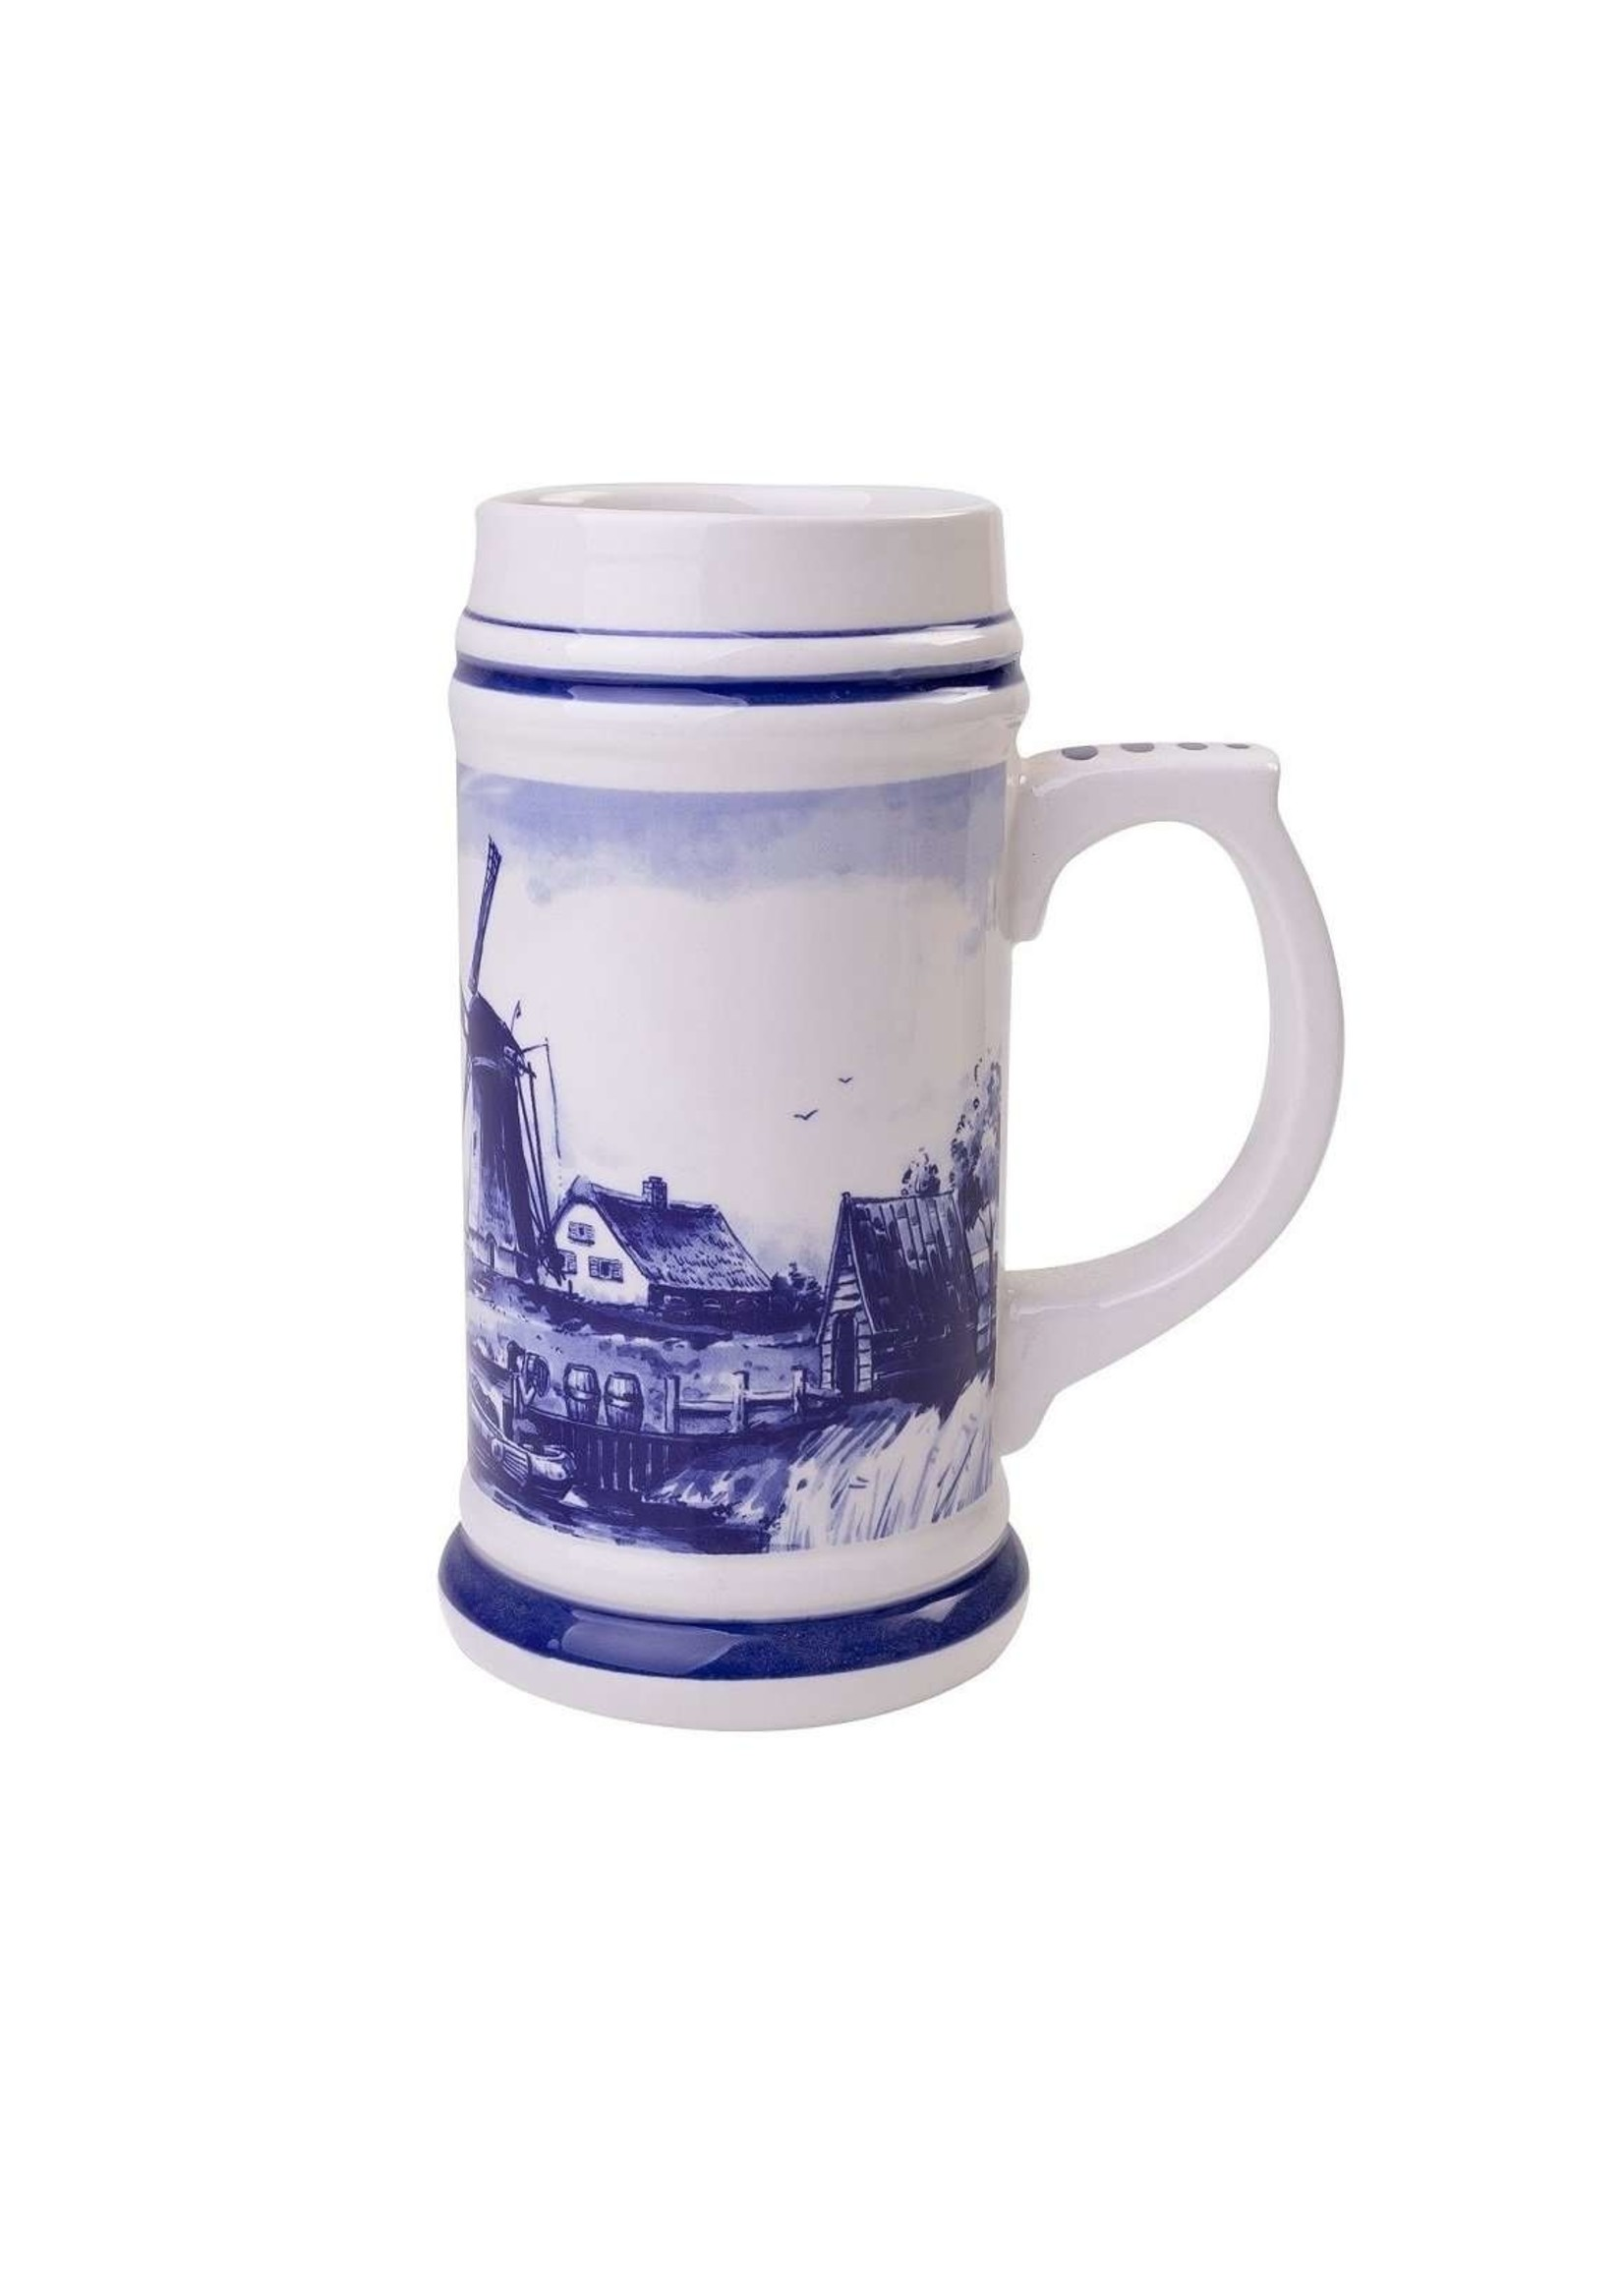 Delft Blue Beer Mug with a Typical Dutch Landscape, 550 ml / 18,6 oz